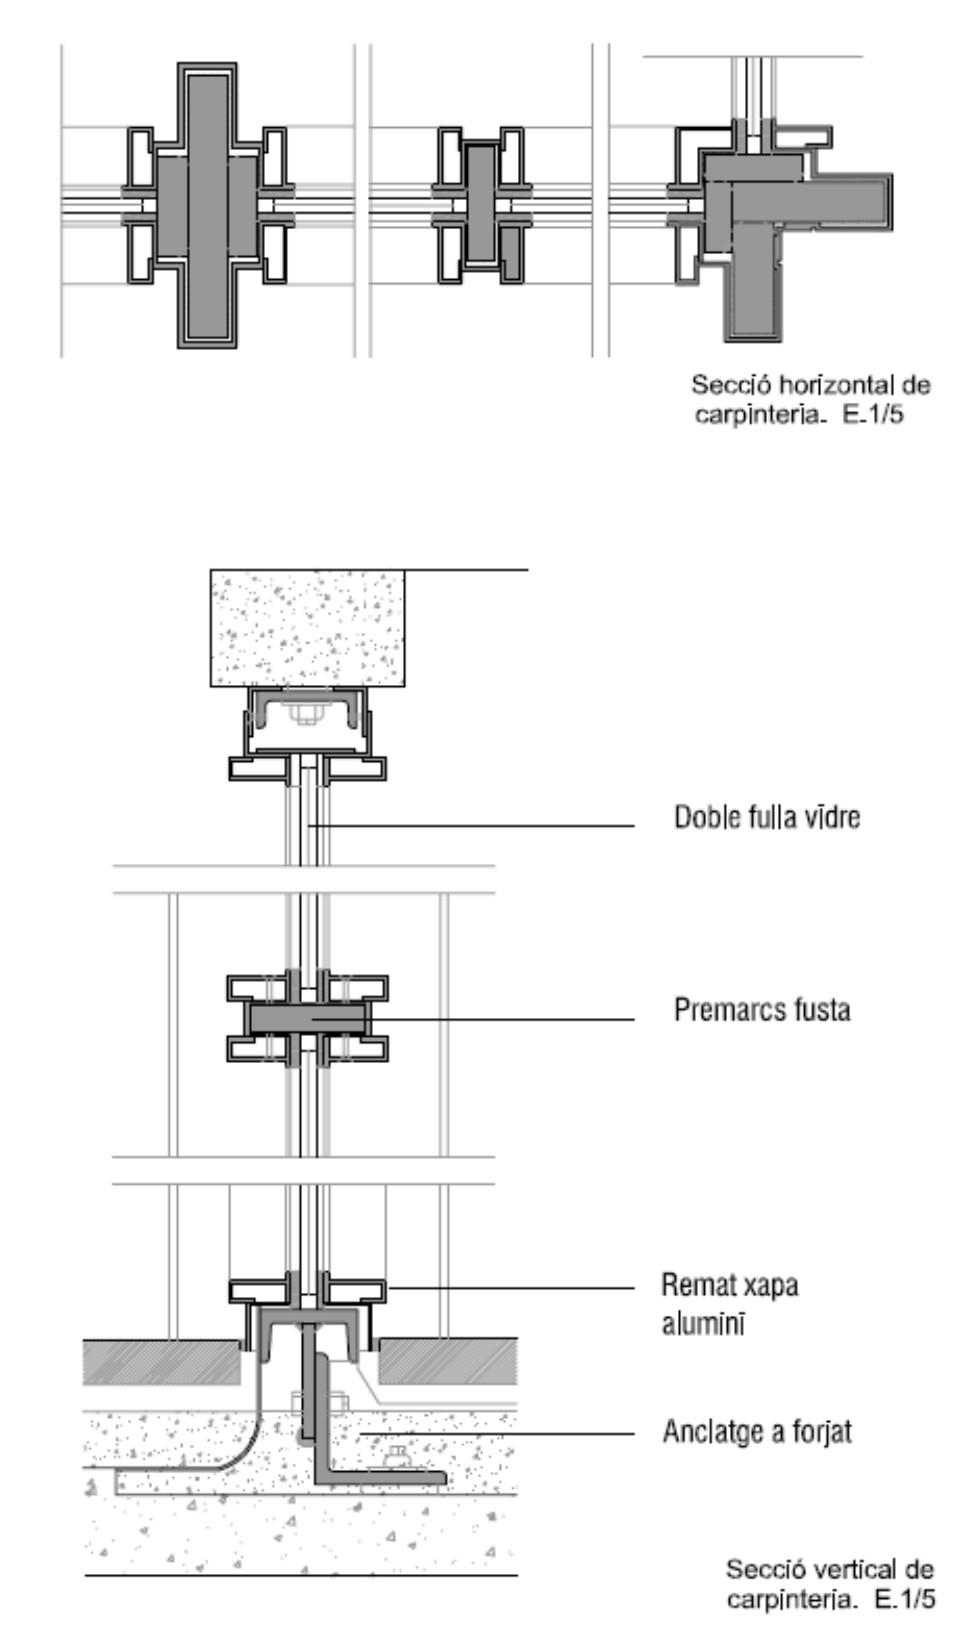 Bacardi detalle carpinteria wikiarquitectura - Detalle carpinteria aluminio ...